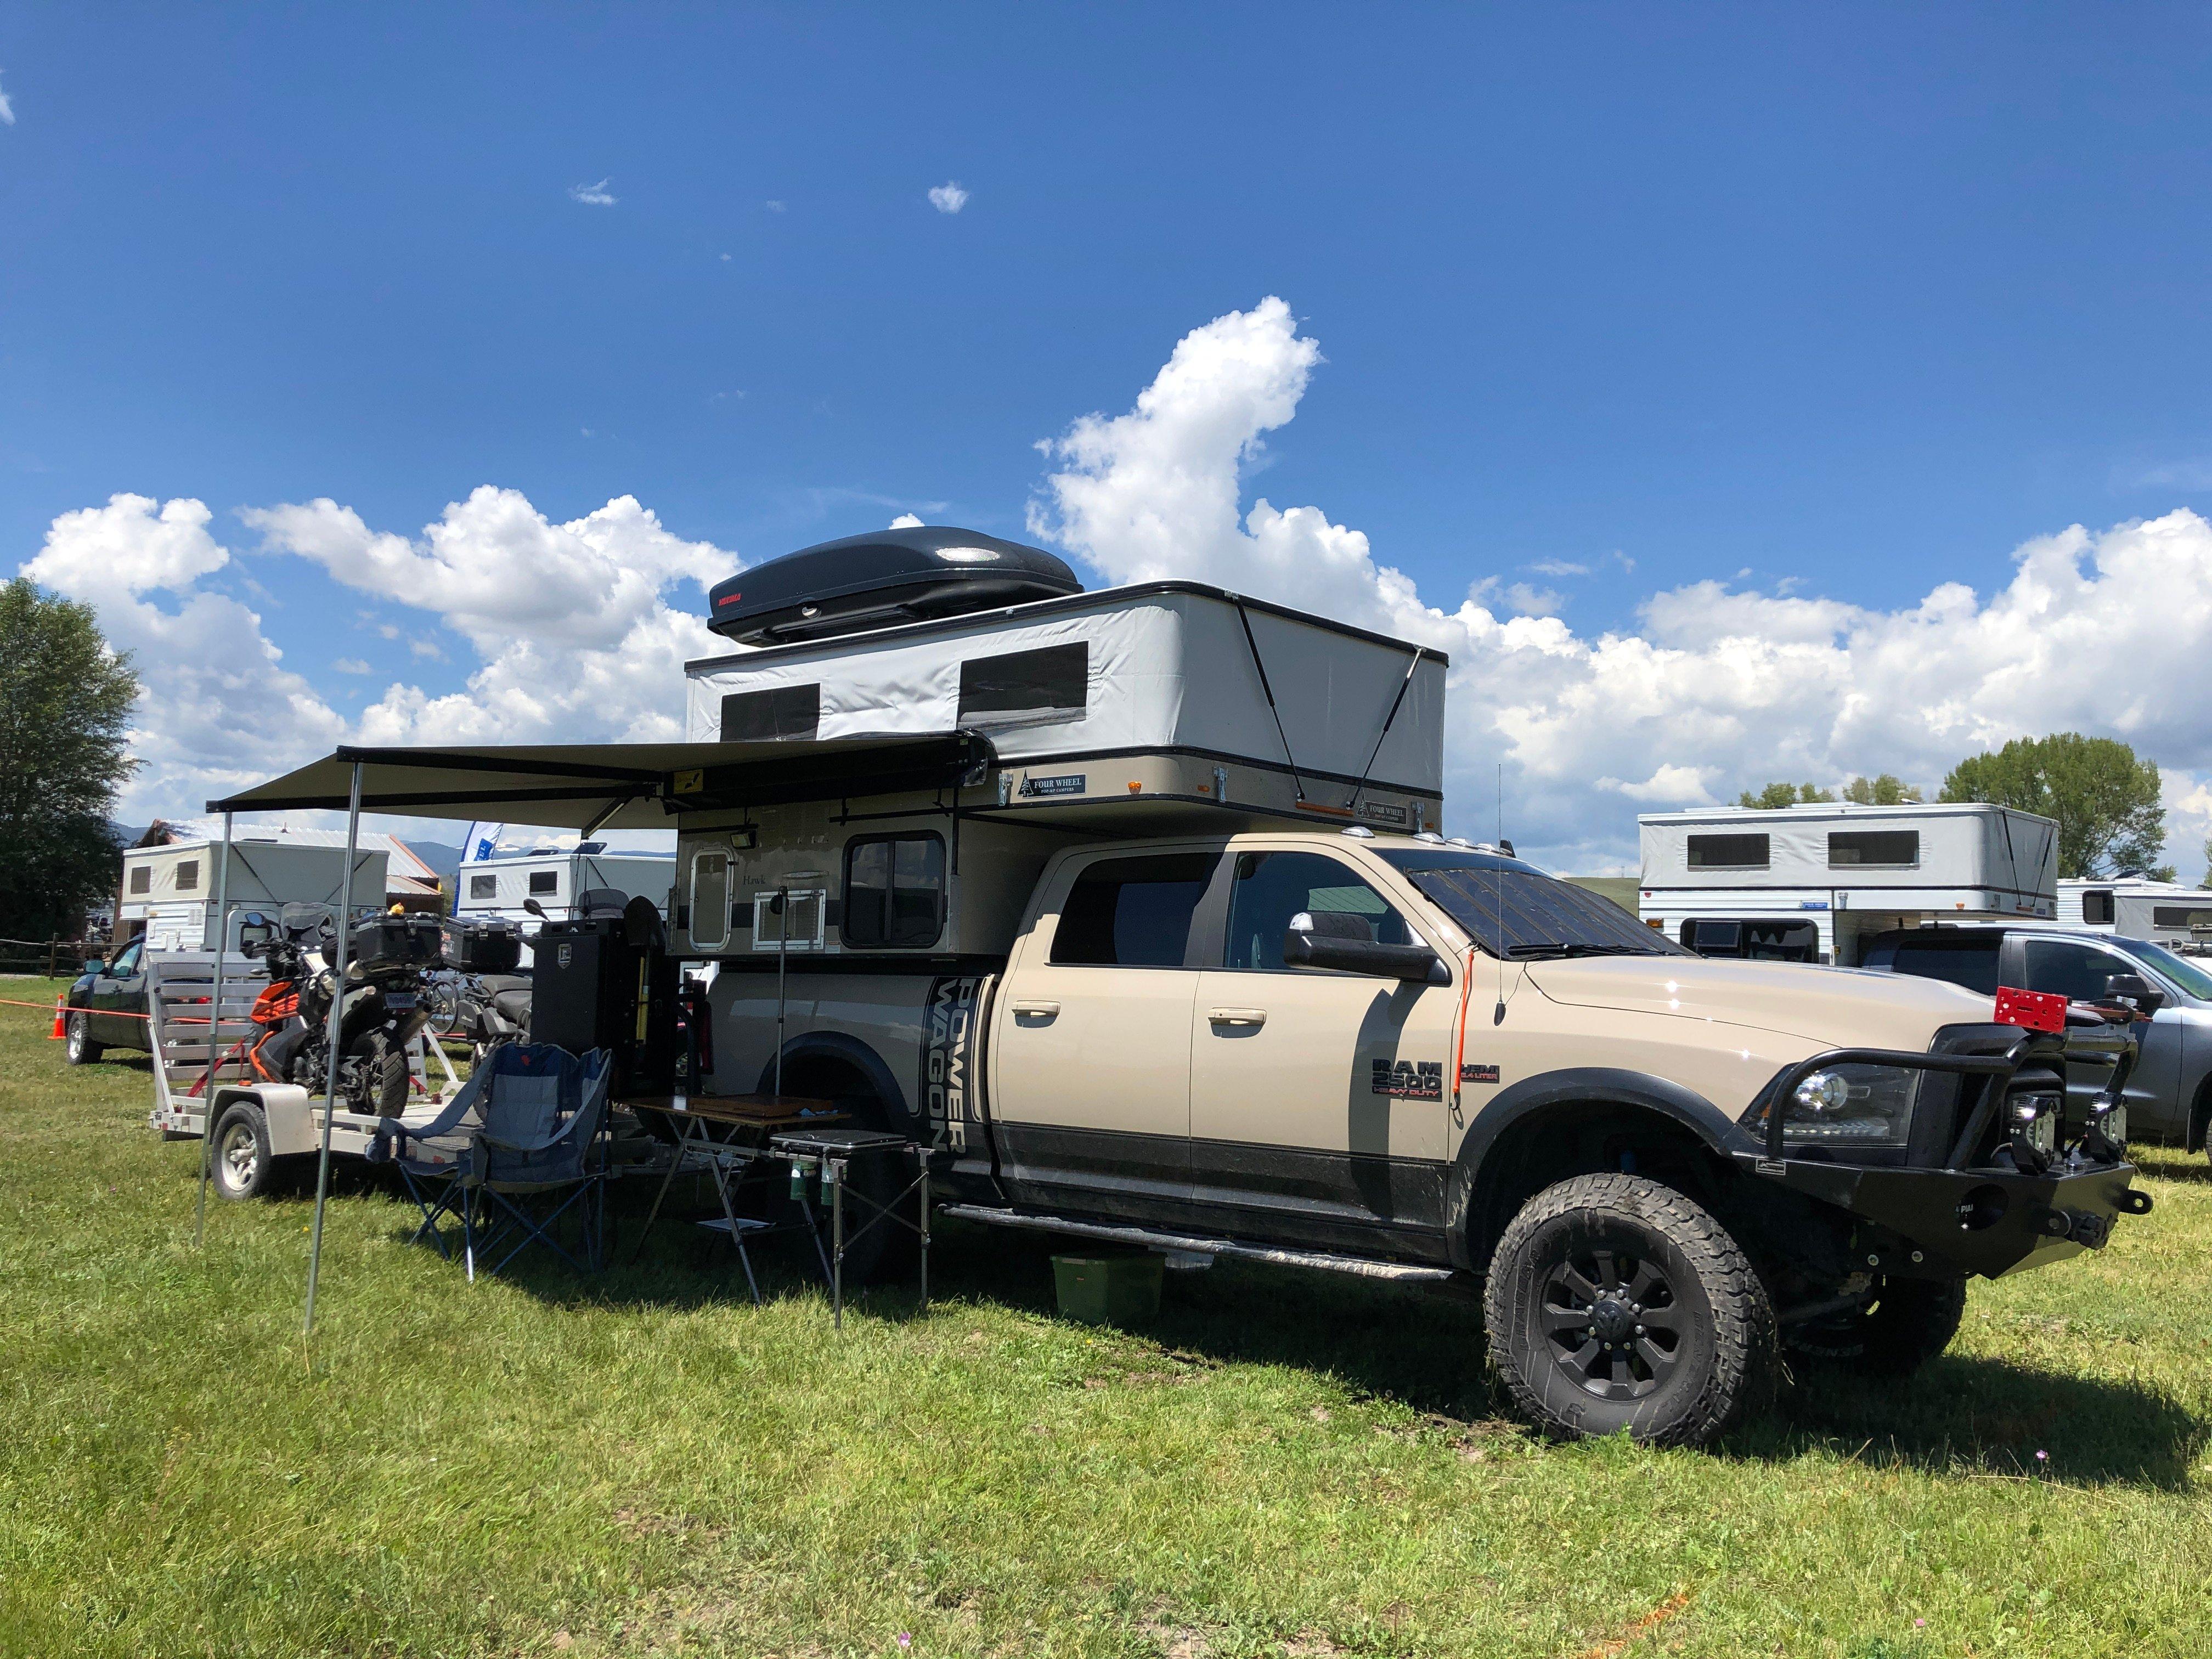 overlanding rooftop tent, truck and trailer